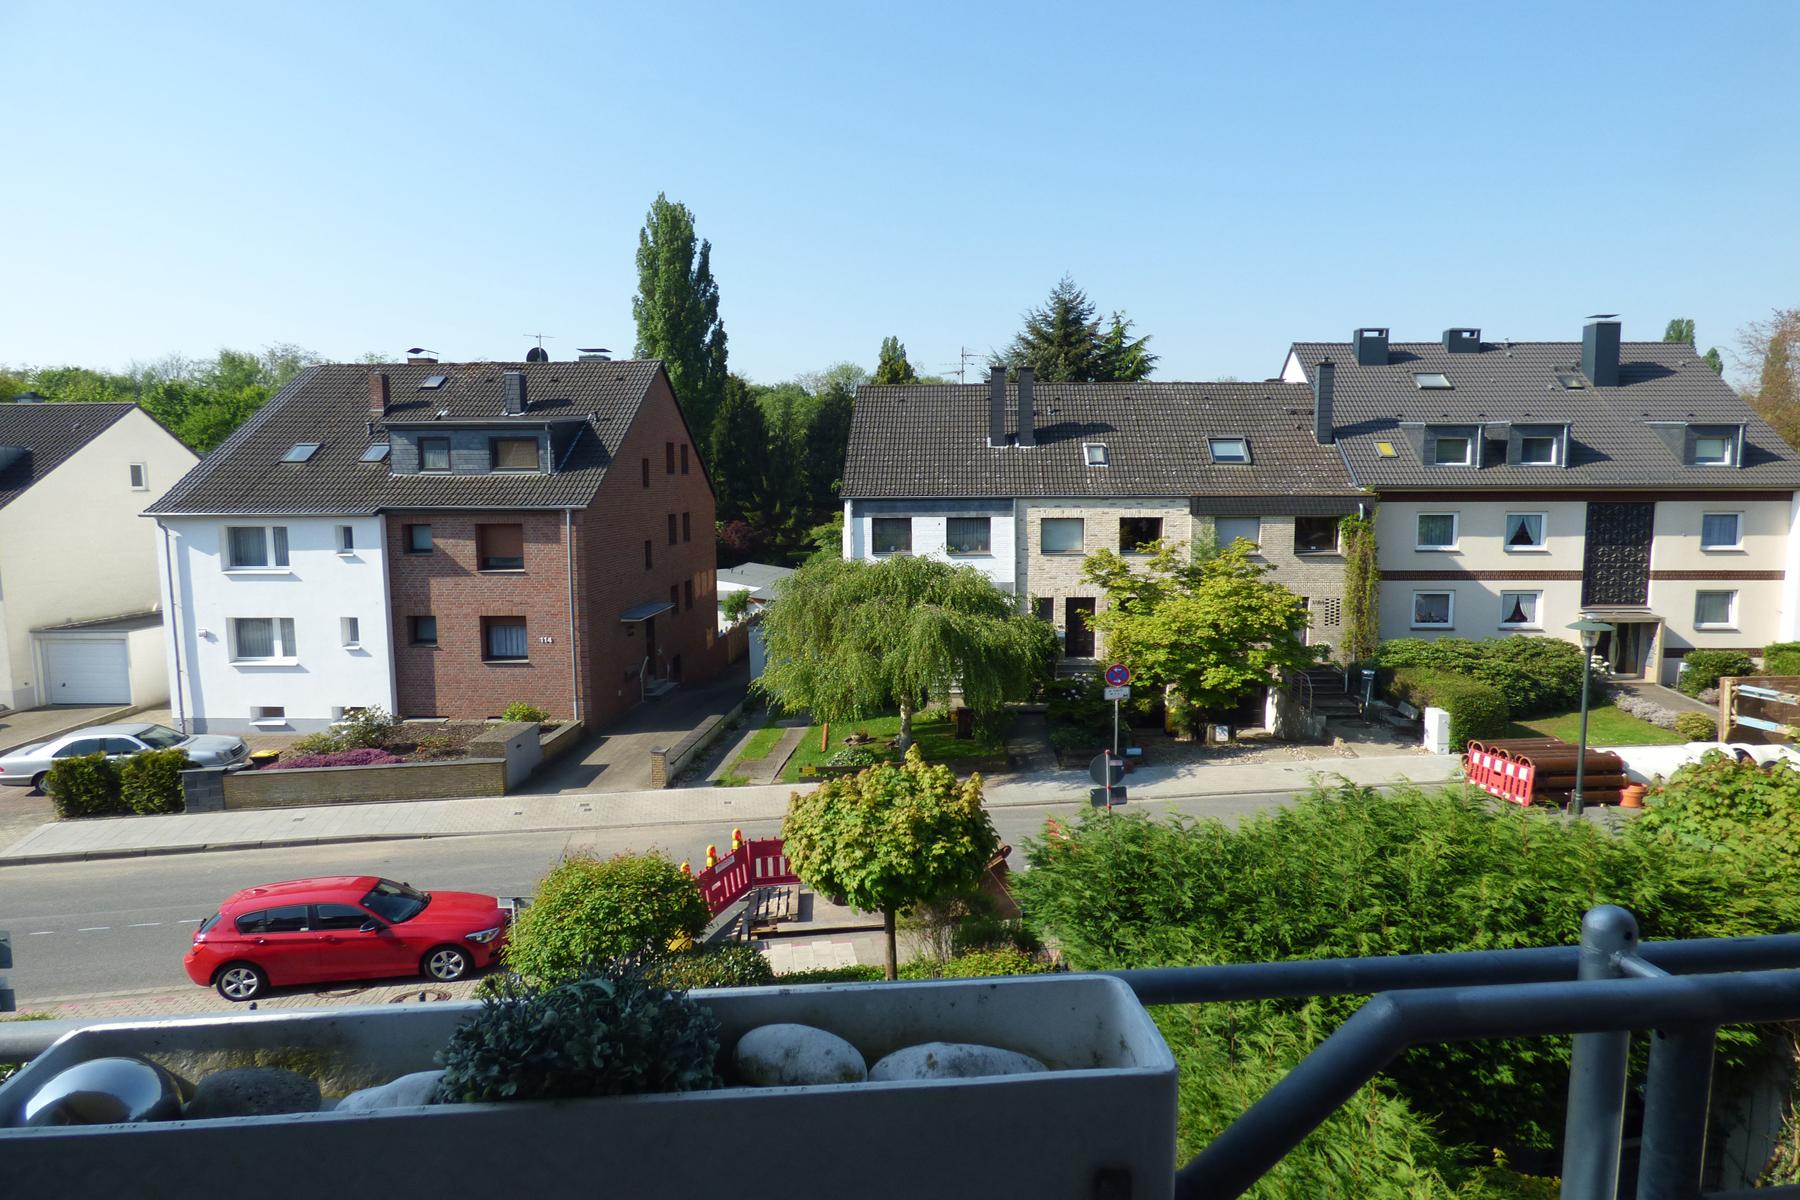 Apartment for Sale at Another Kind of Health Resort Dusseldorf, Nordrhein-Westfalen, 40627 Germany